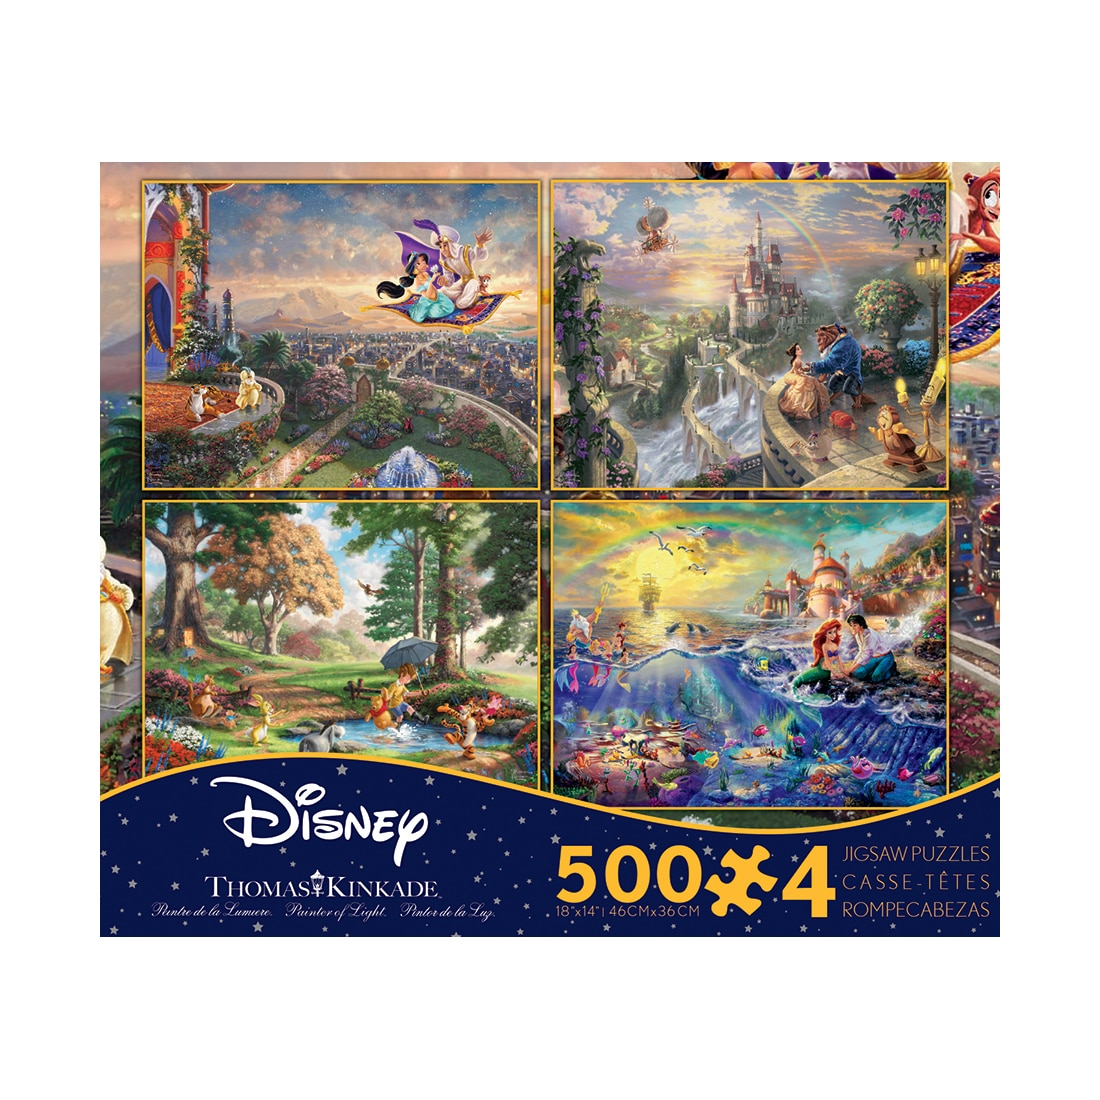 Ceaco Thomas Kinkade Disney Dreams - 4-in-1 Jigsaw Puzzle...